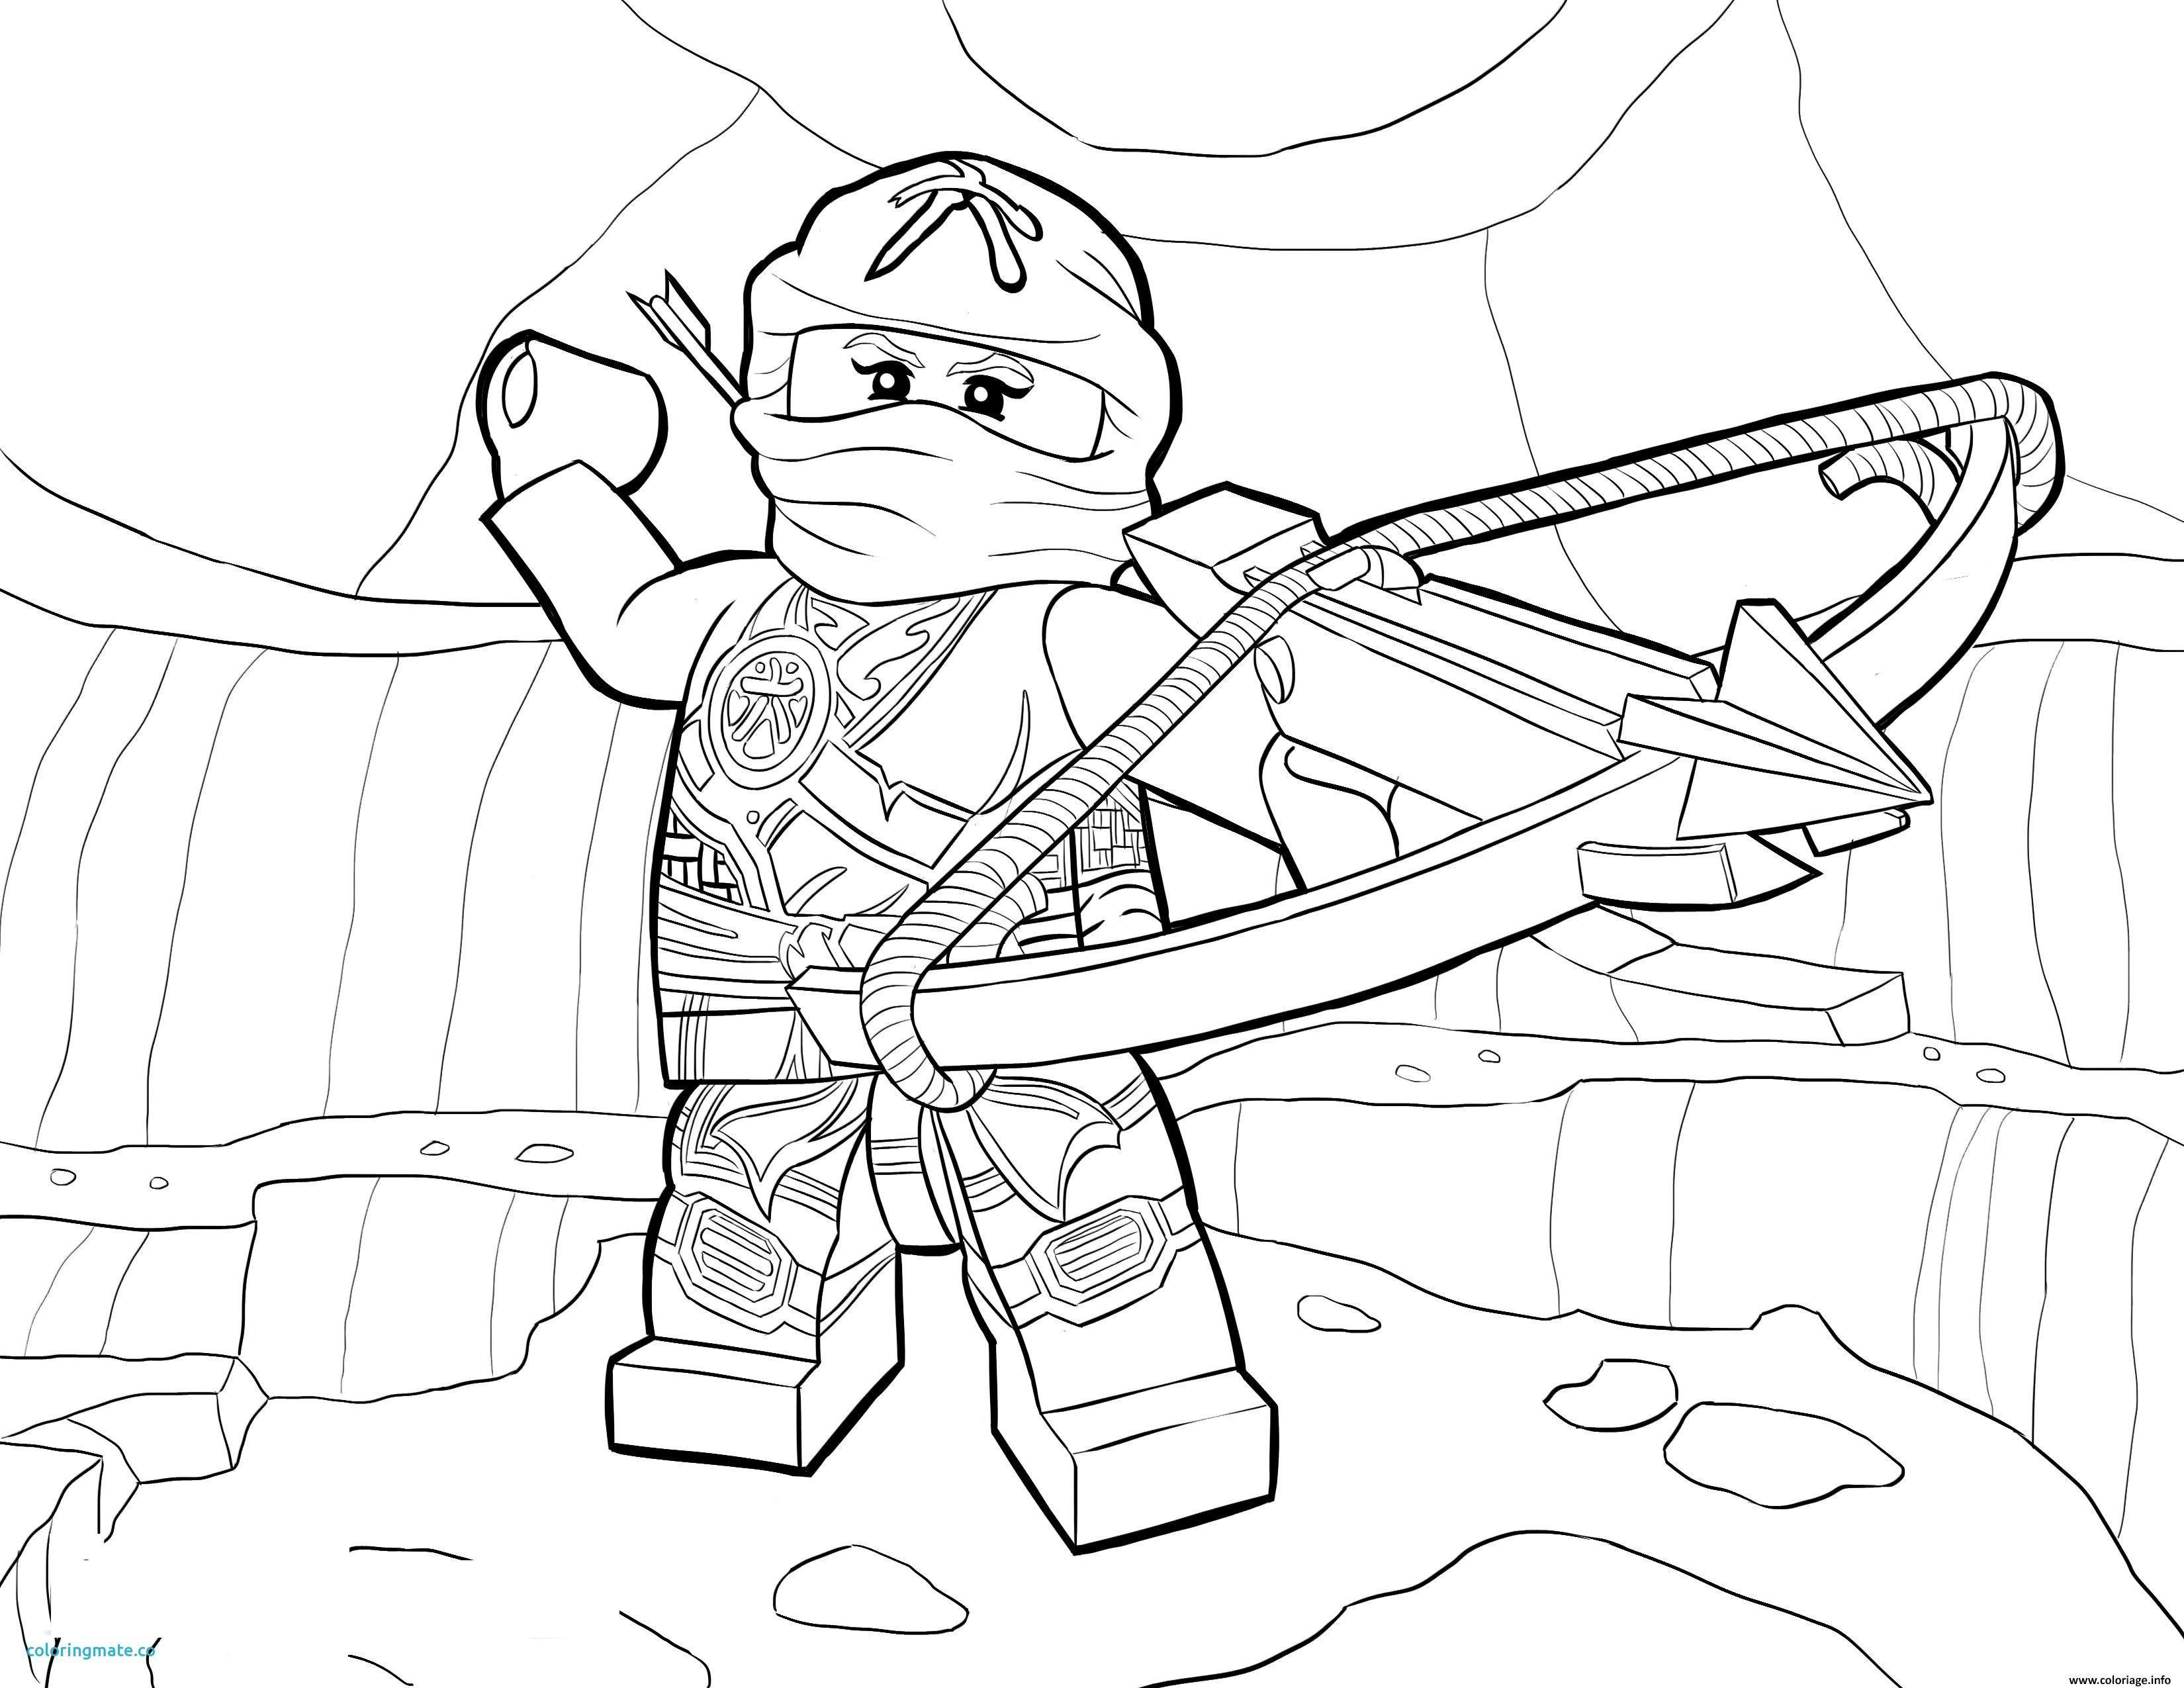 Coloriage Lego Ninjago Fresh Coloriage Ninjago Dessin A Imprimer